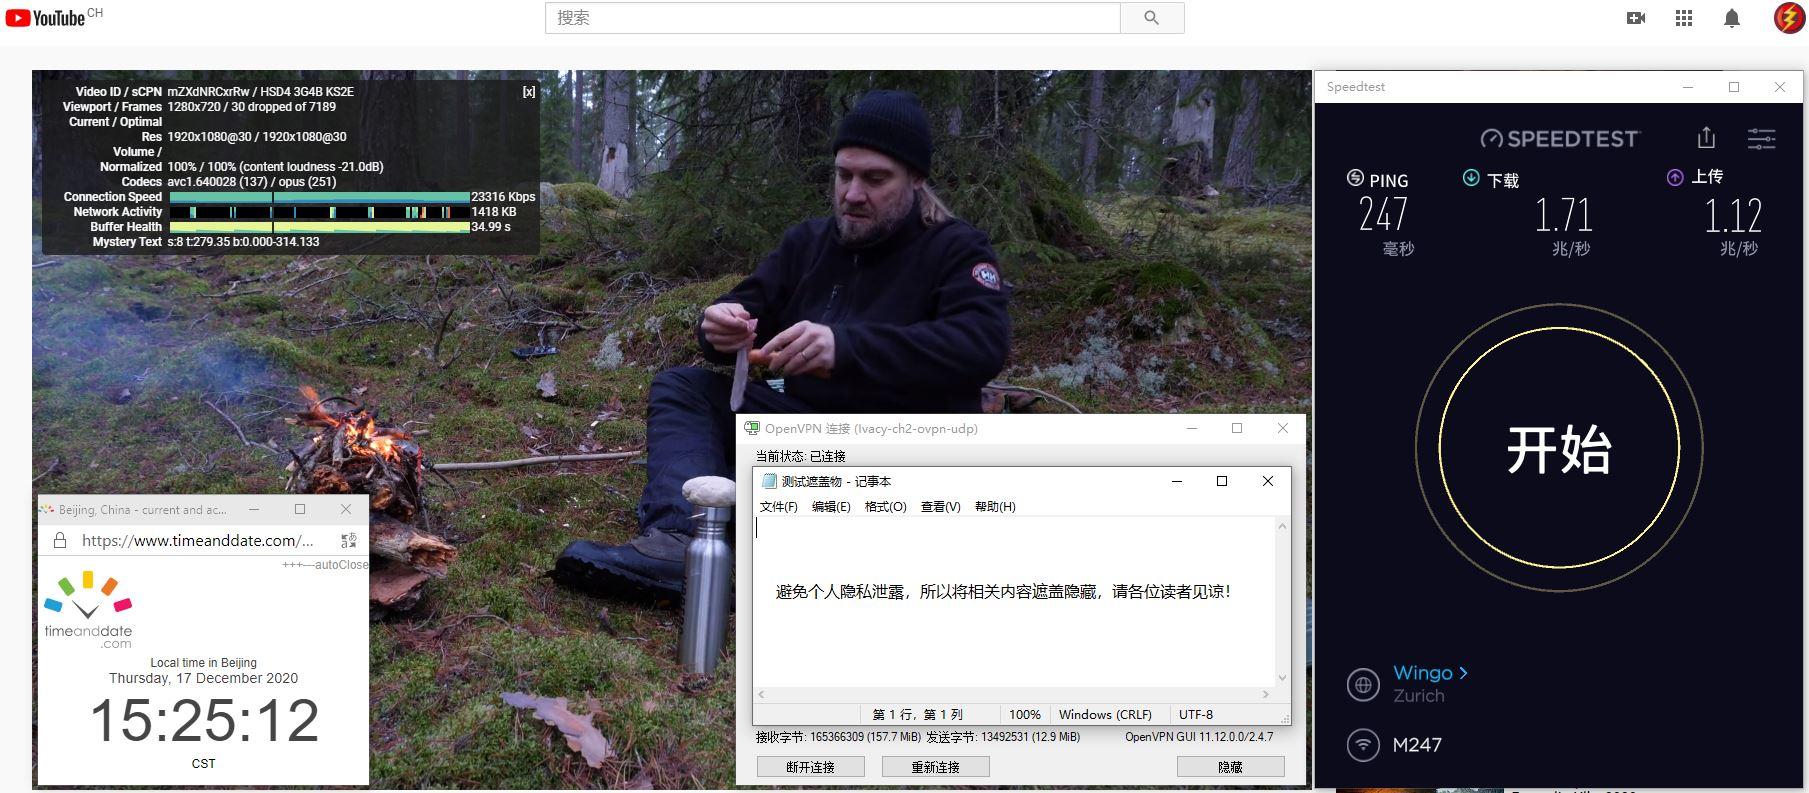 Windows10 IvacyVPN OpenVPN GUI ch2 服务器 中国VPN 翻墙 科学上网 测试 - 20201217